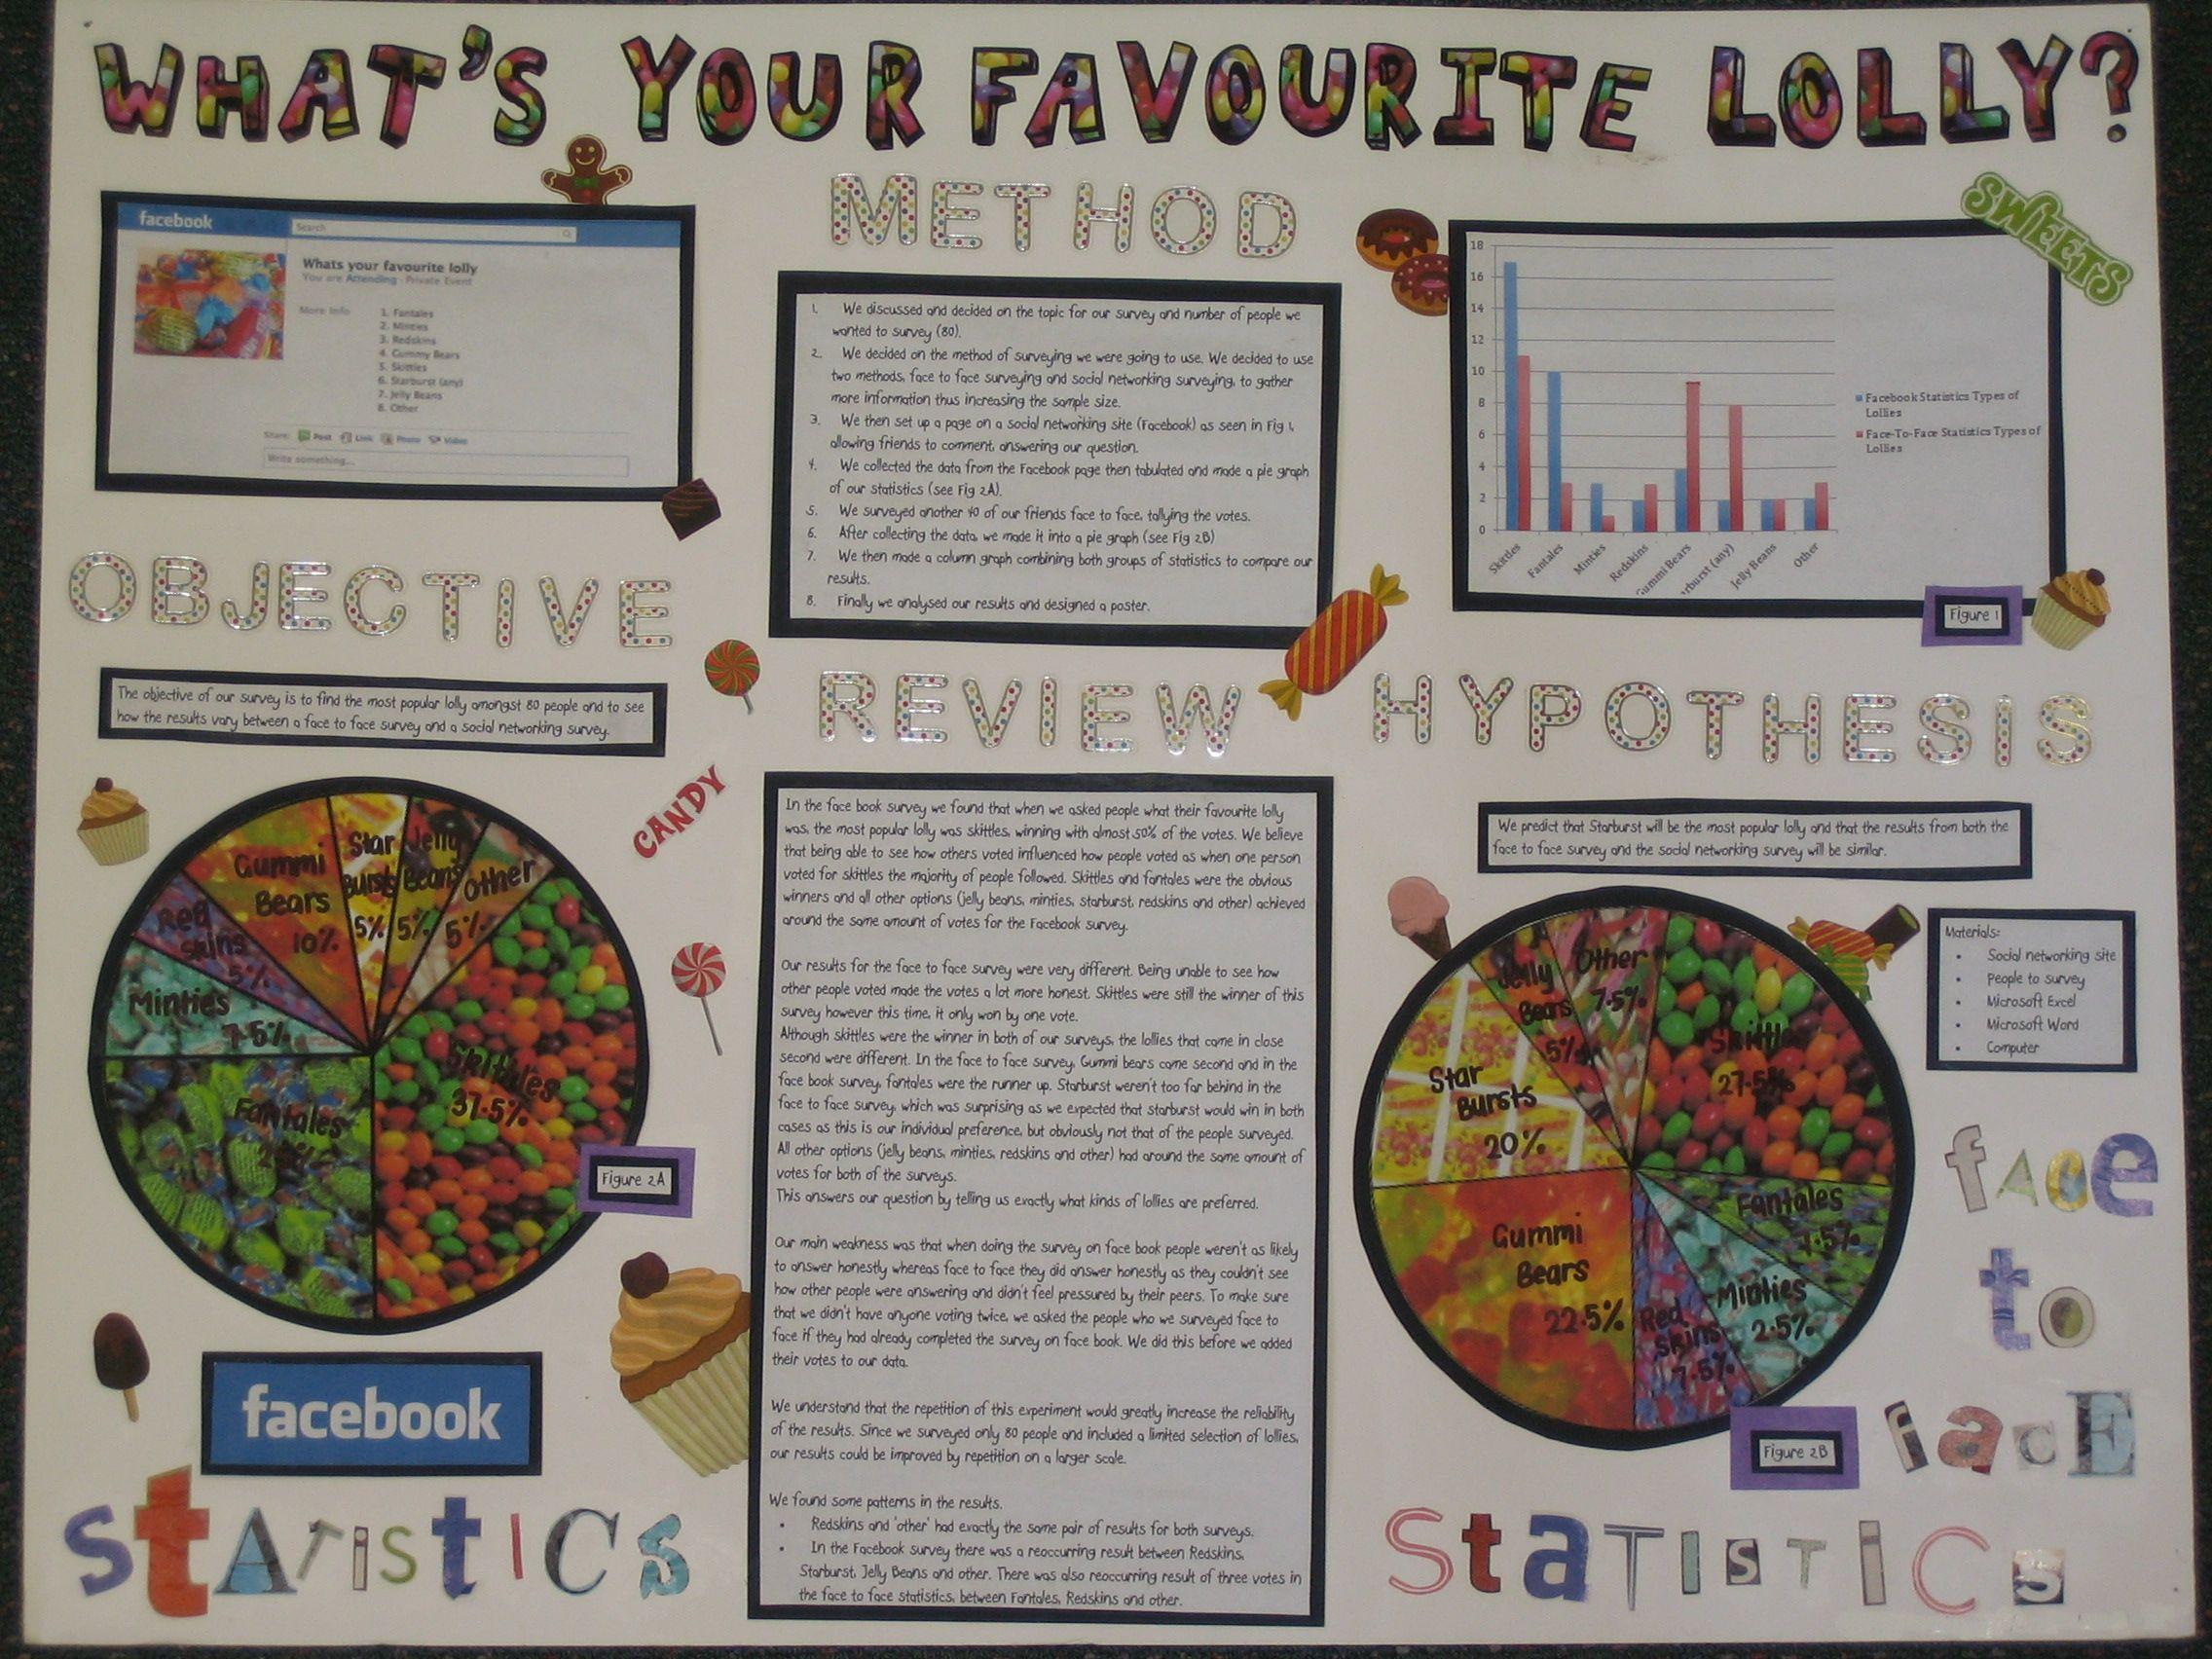 candy data | School creative, Creative school project ...